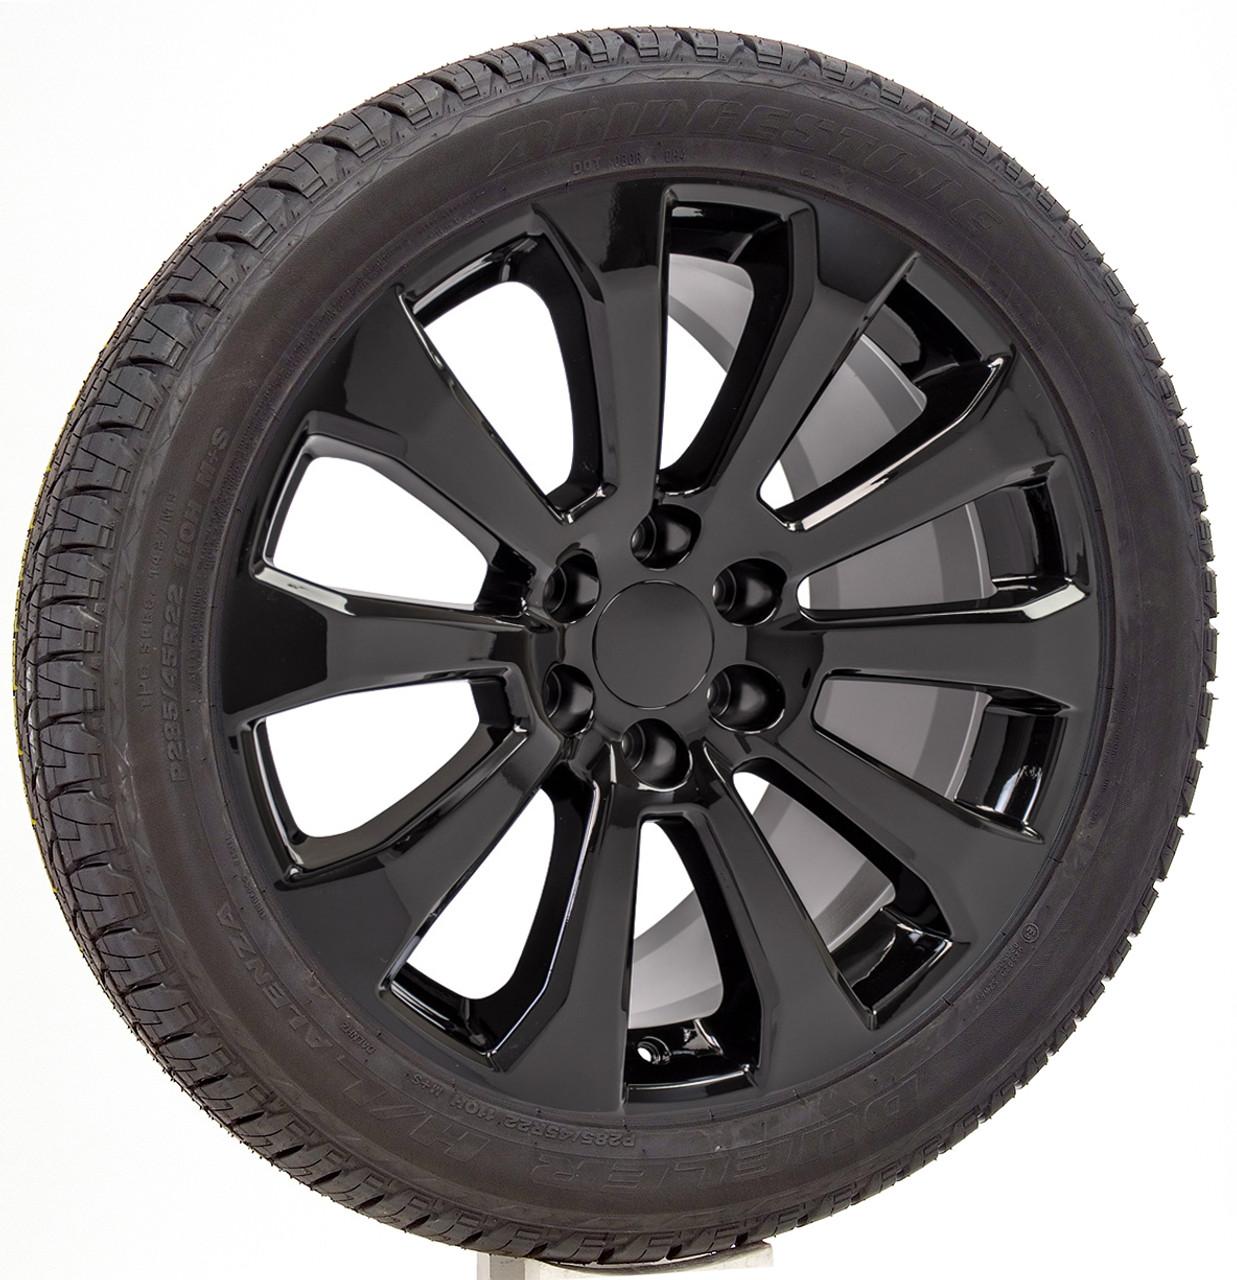 "Gloss Black 22"" High Country Ten Spoke Wheels with Bridgestone Tires for Chevy Silverado, Tahoe, Suburban - New Set of 4"